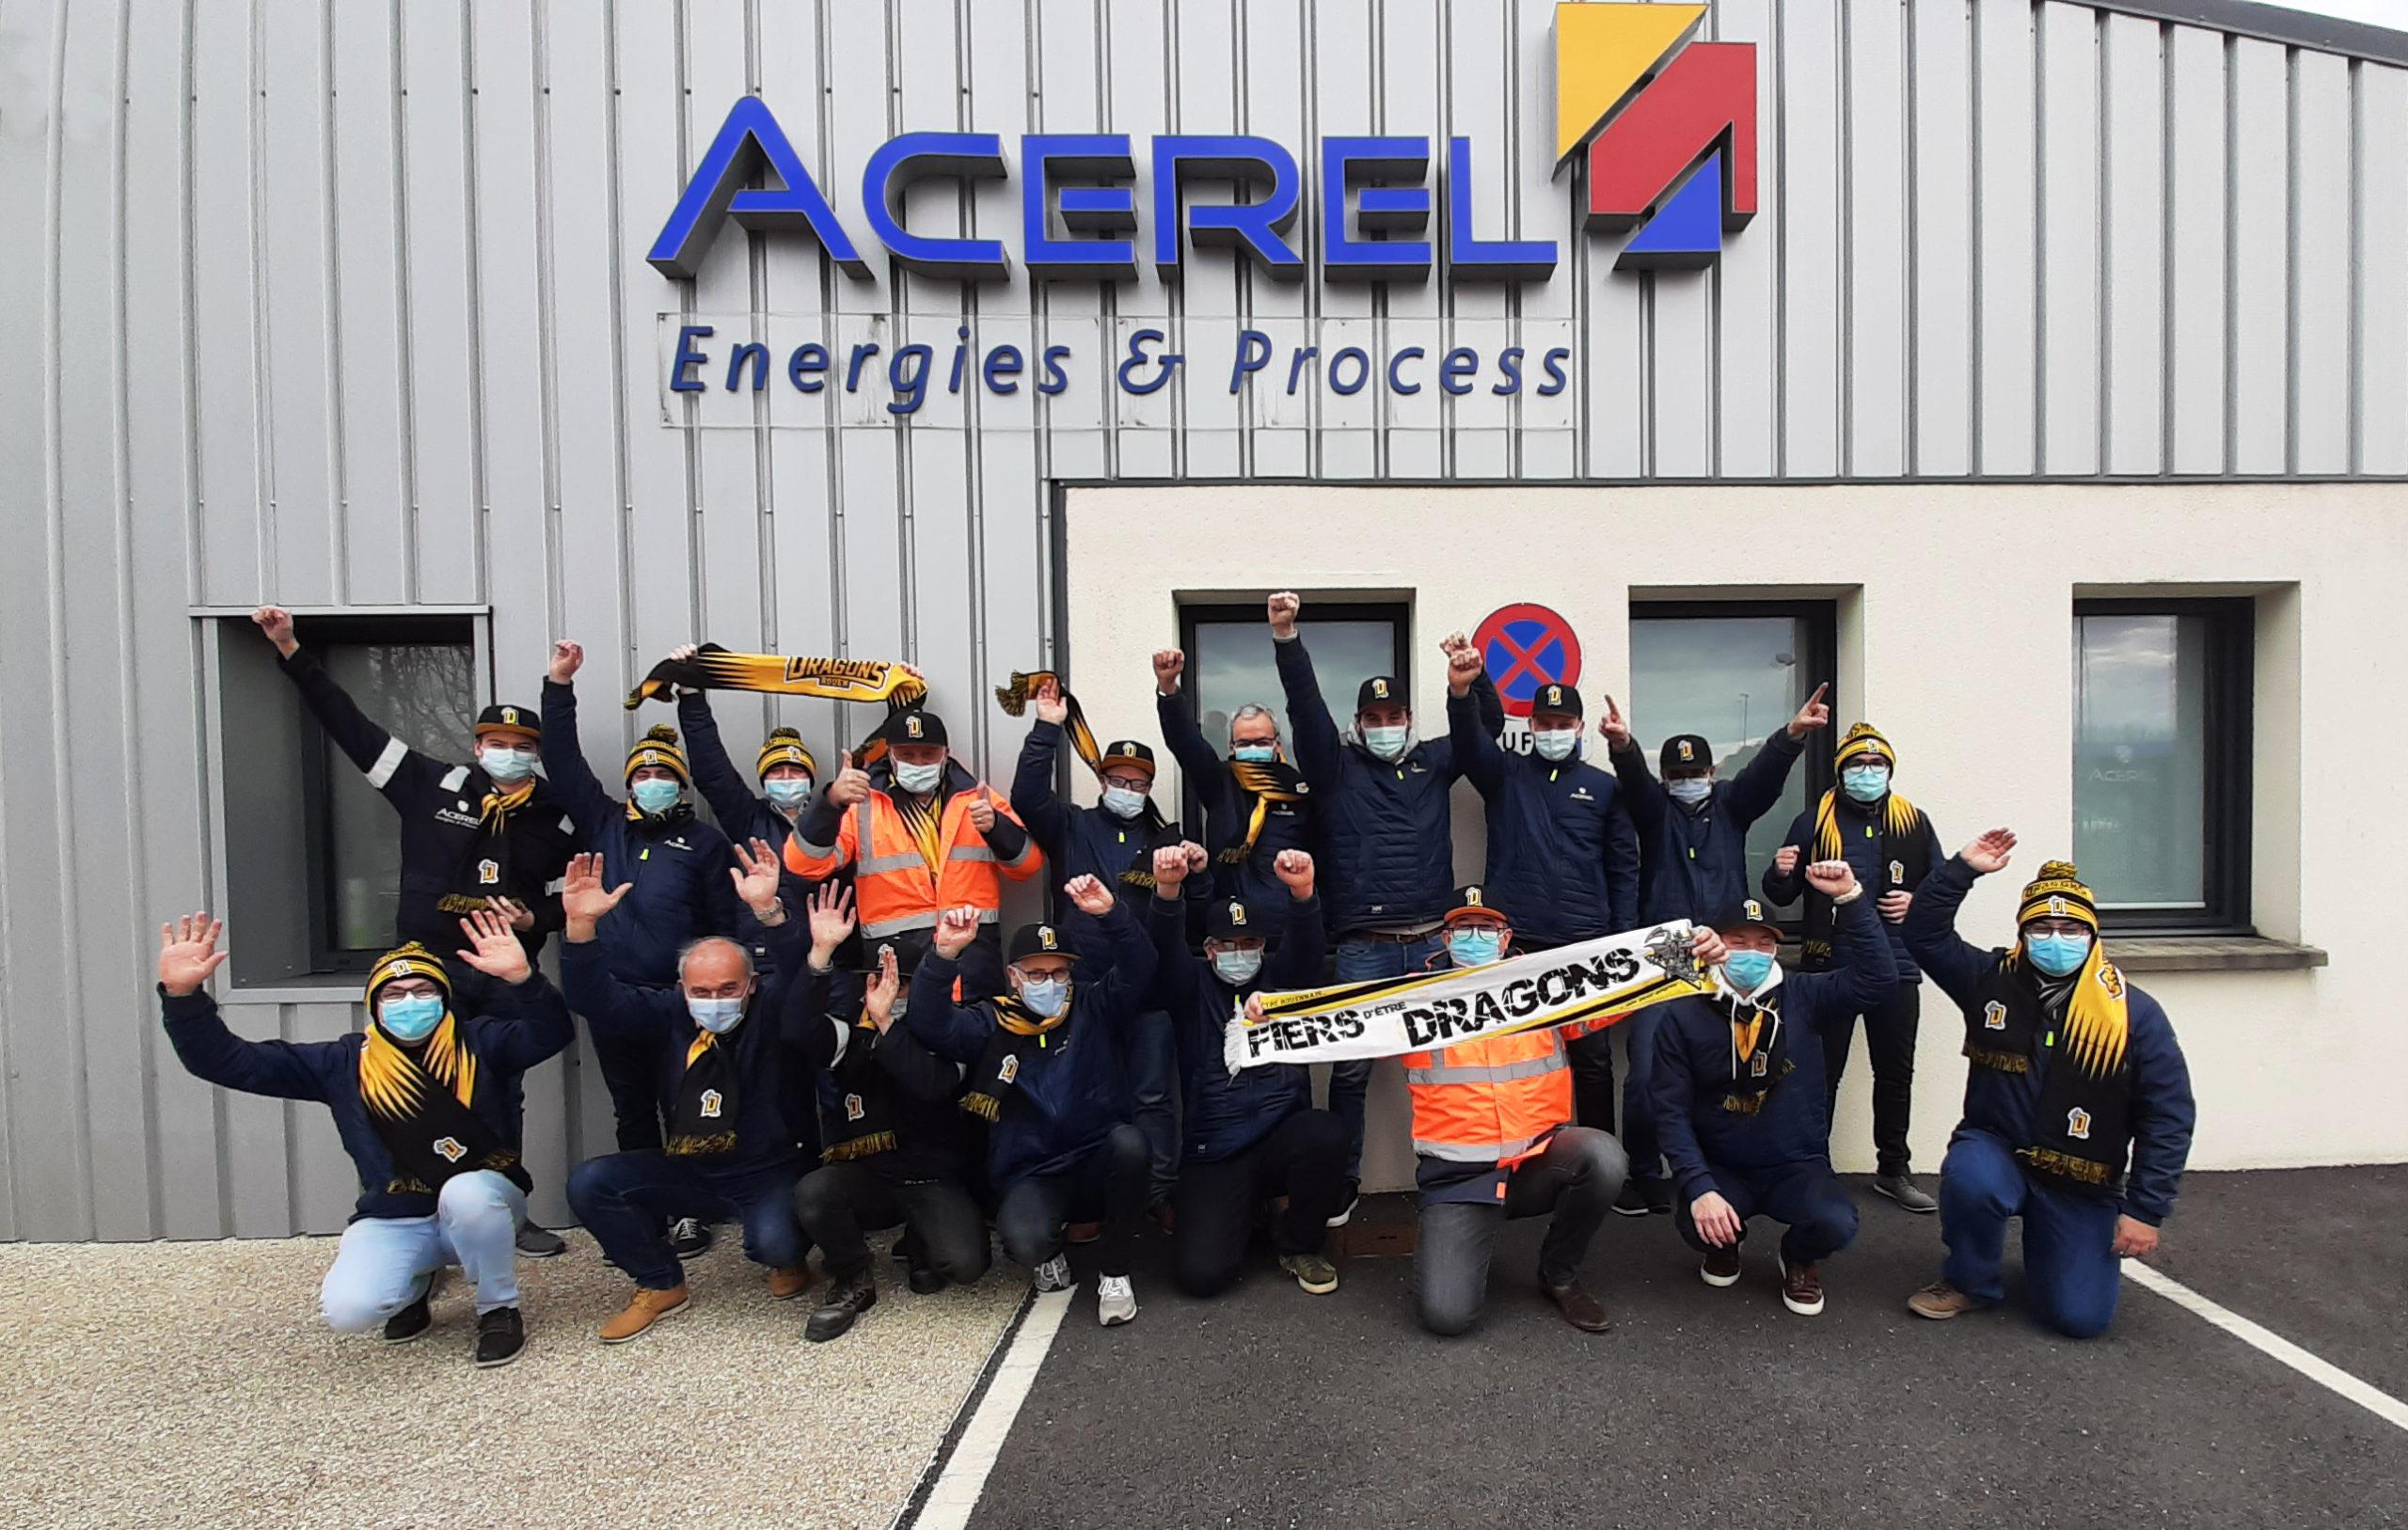 ACEREL partenaire du RHE76